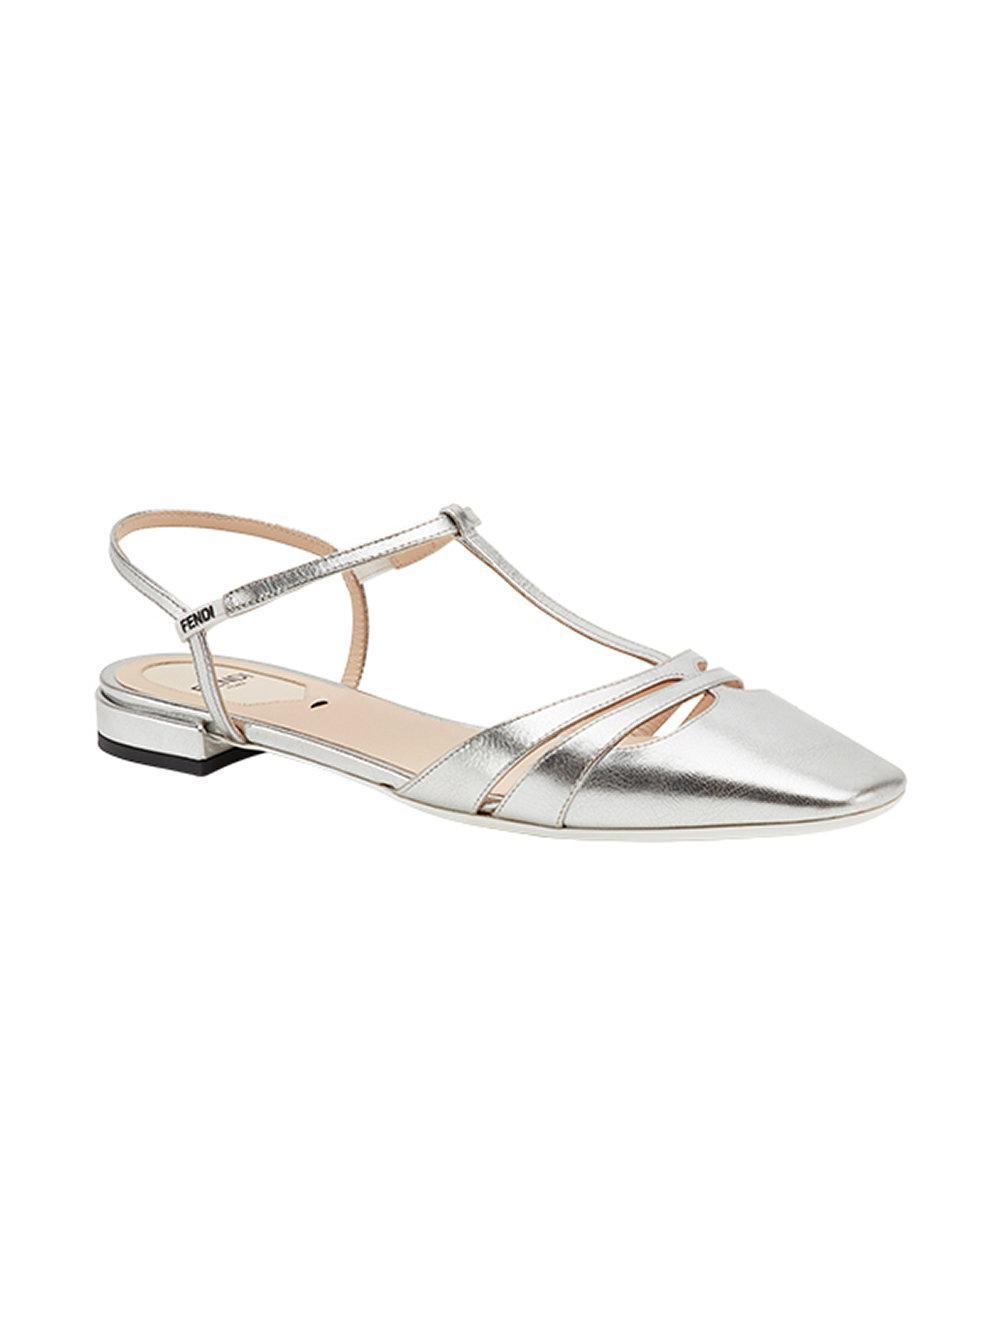 T-bar ballerinas - Metallic Fendi Outlet Buy buekE6mrZ